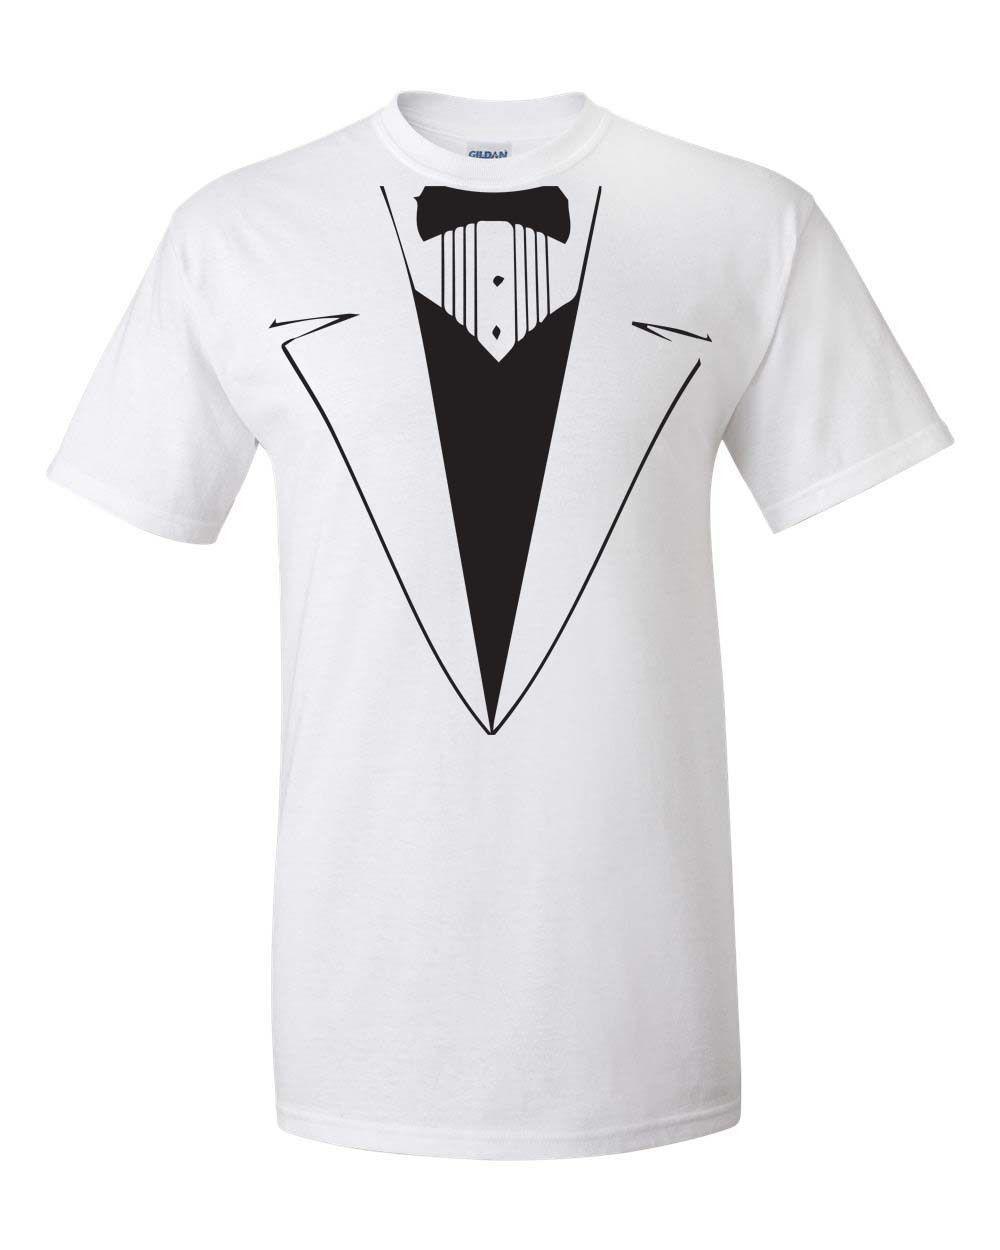 0c667fba Wholesale Discount Summer Fashion Funny Print T Shirts Tuxedo Tux Wedding  Funny Gift Groom College Party Men'S Tee Shirt Funny Tshirts Long Sleeve  Shirts ...